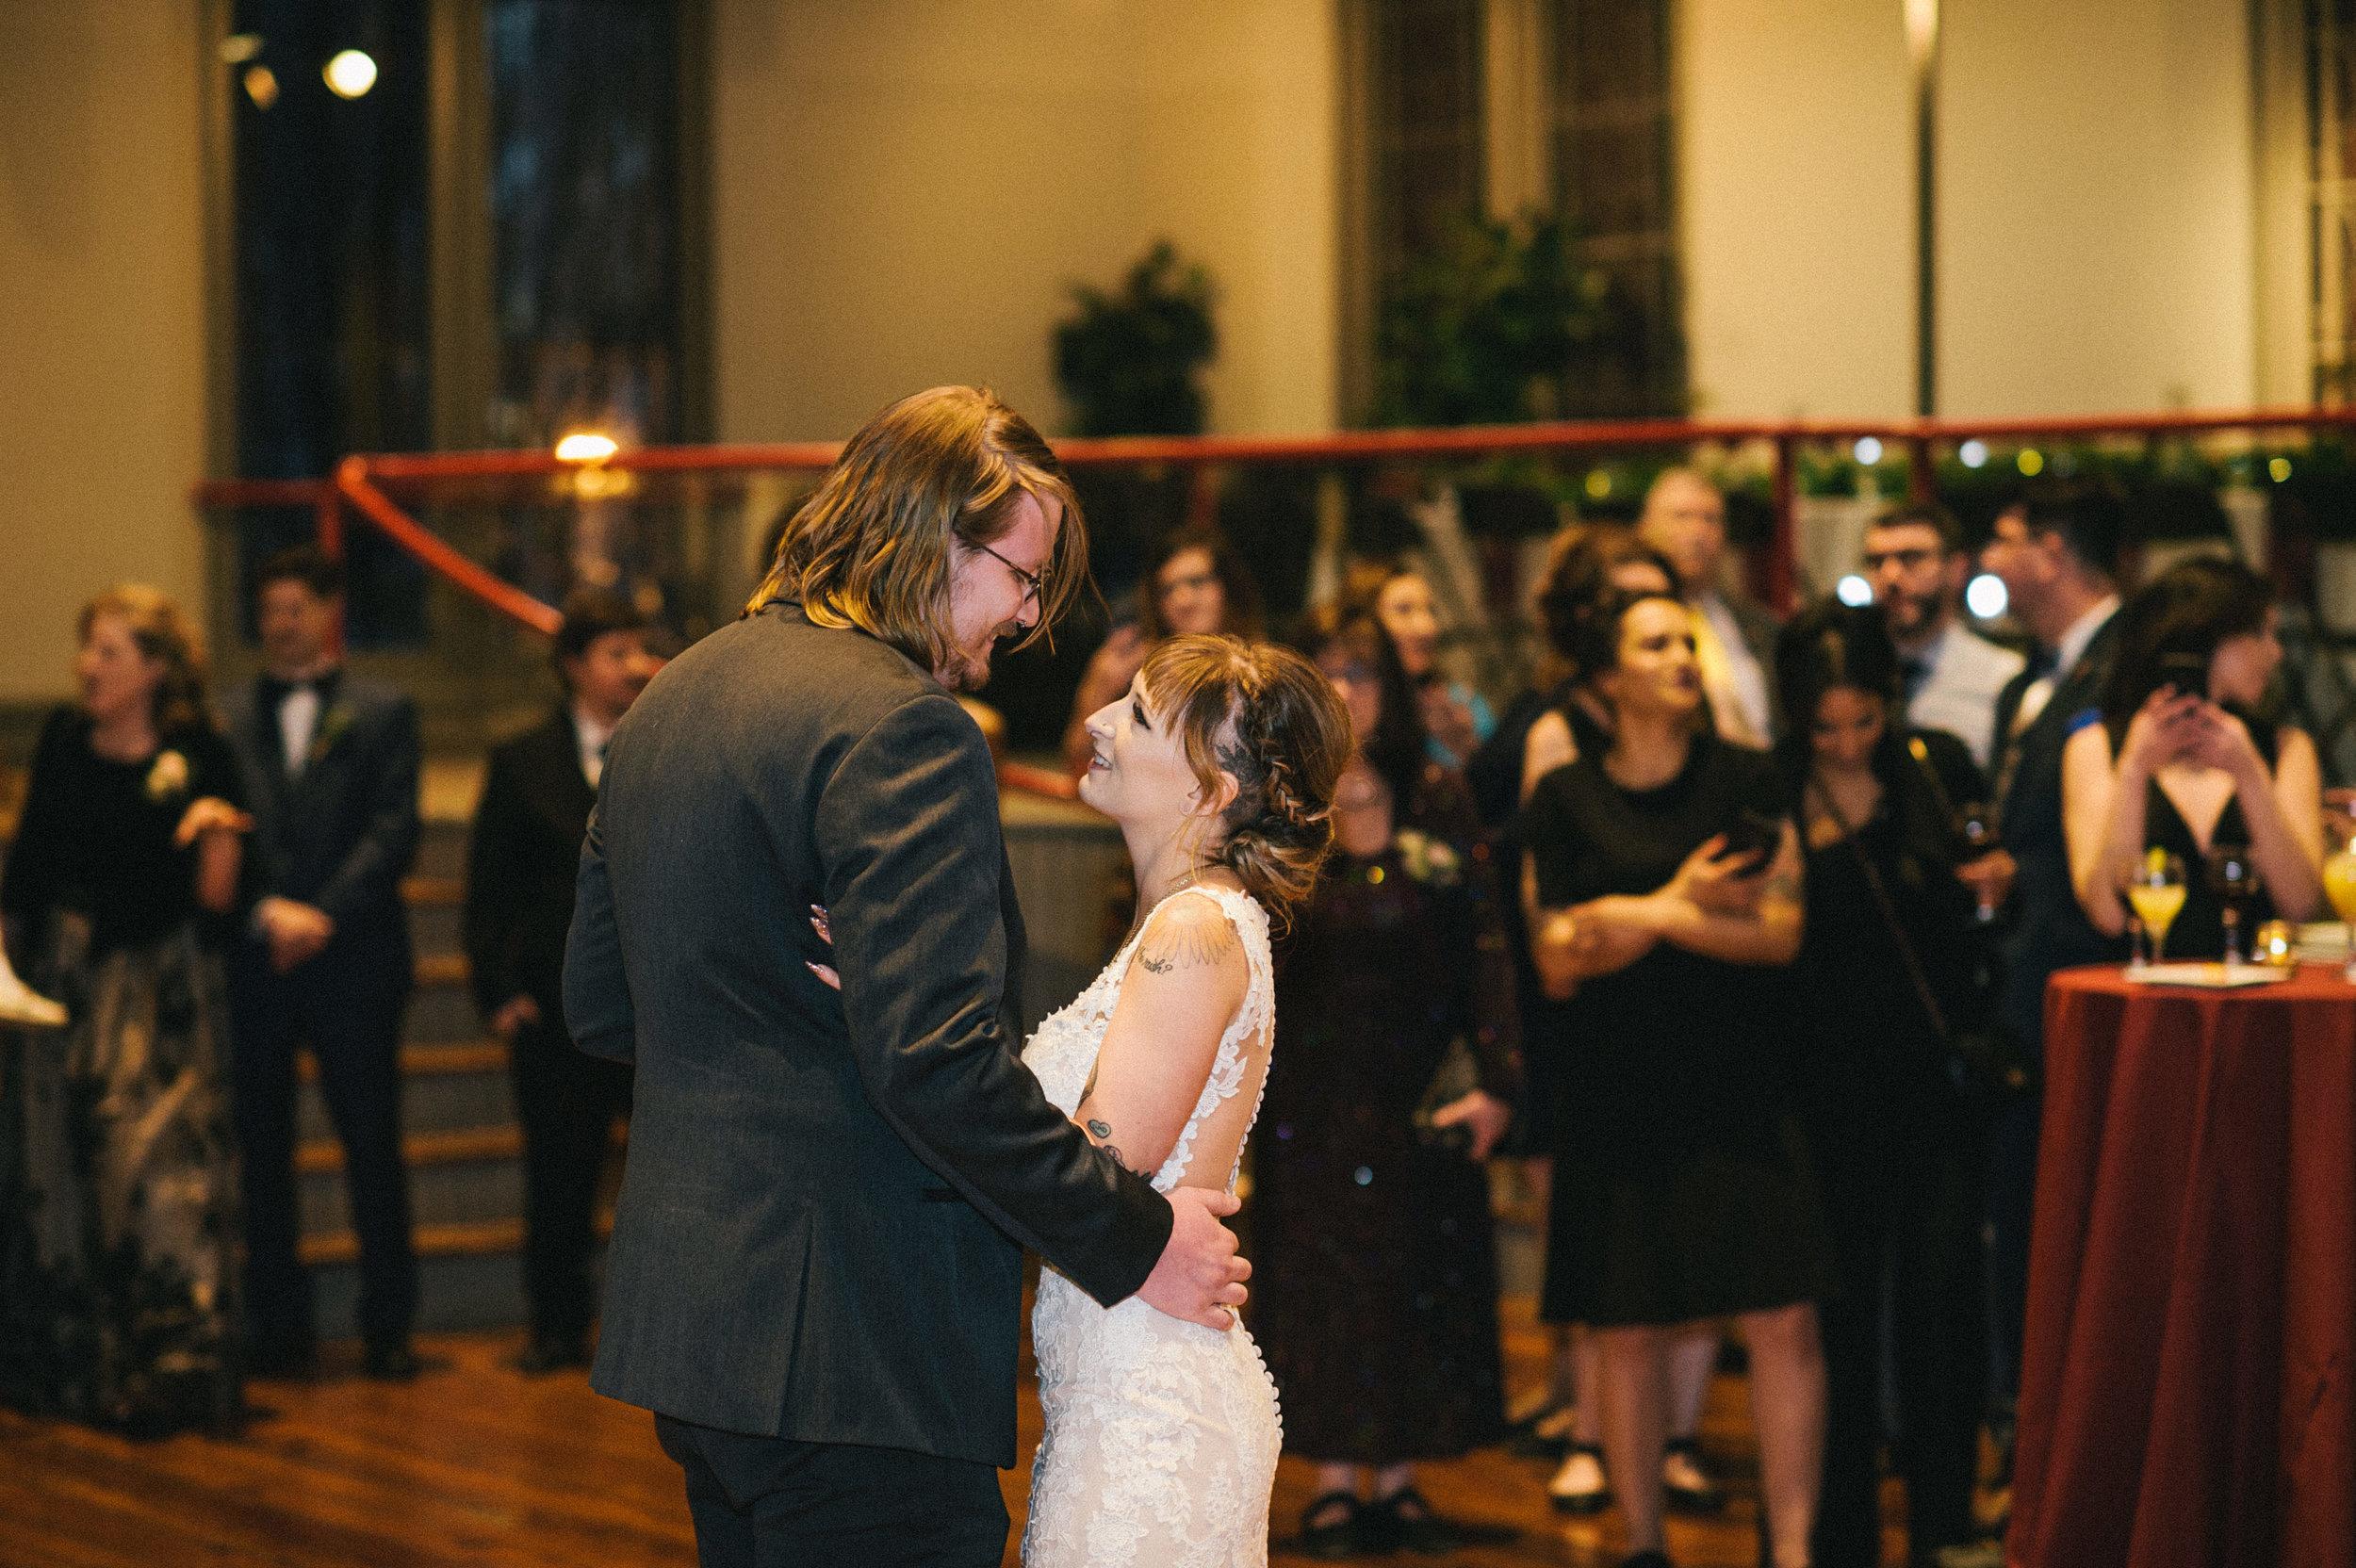 Amber and Kyles Wedding 48.jpg